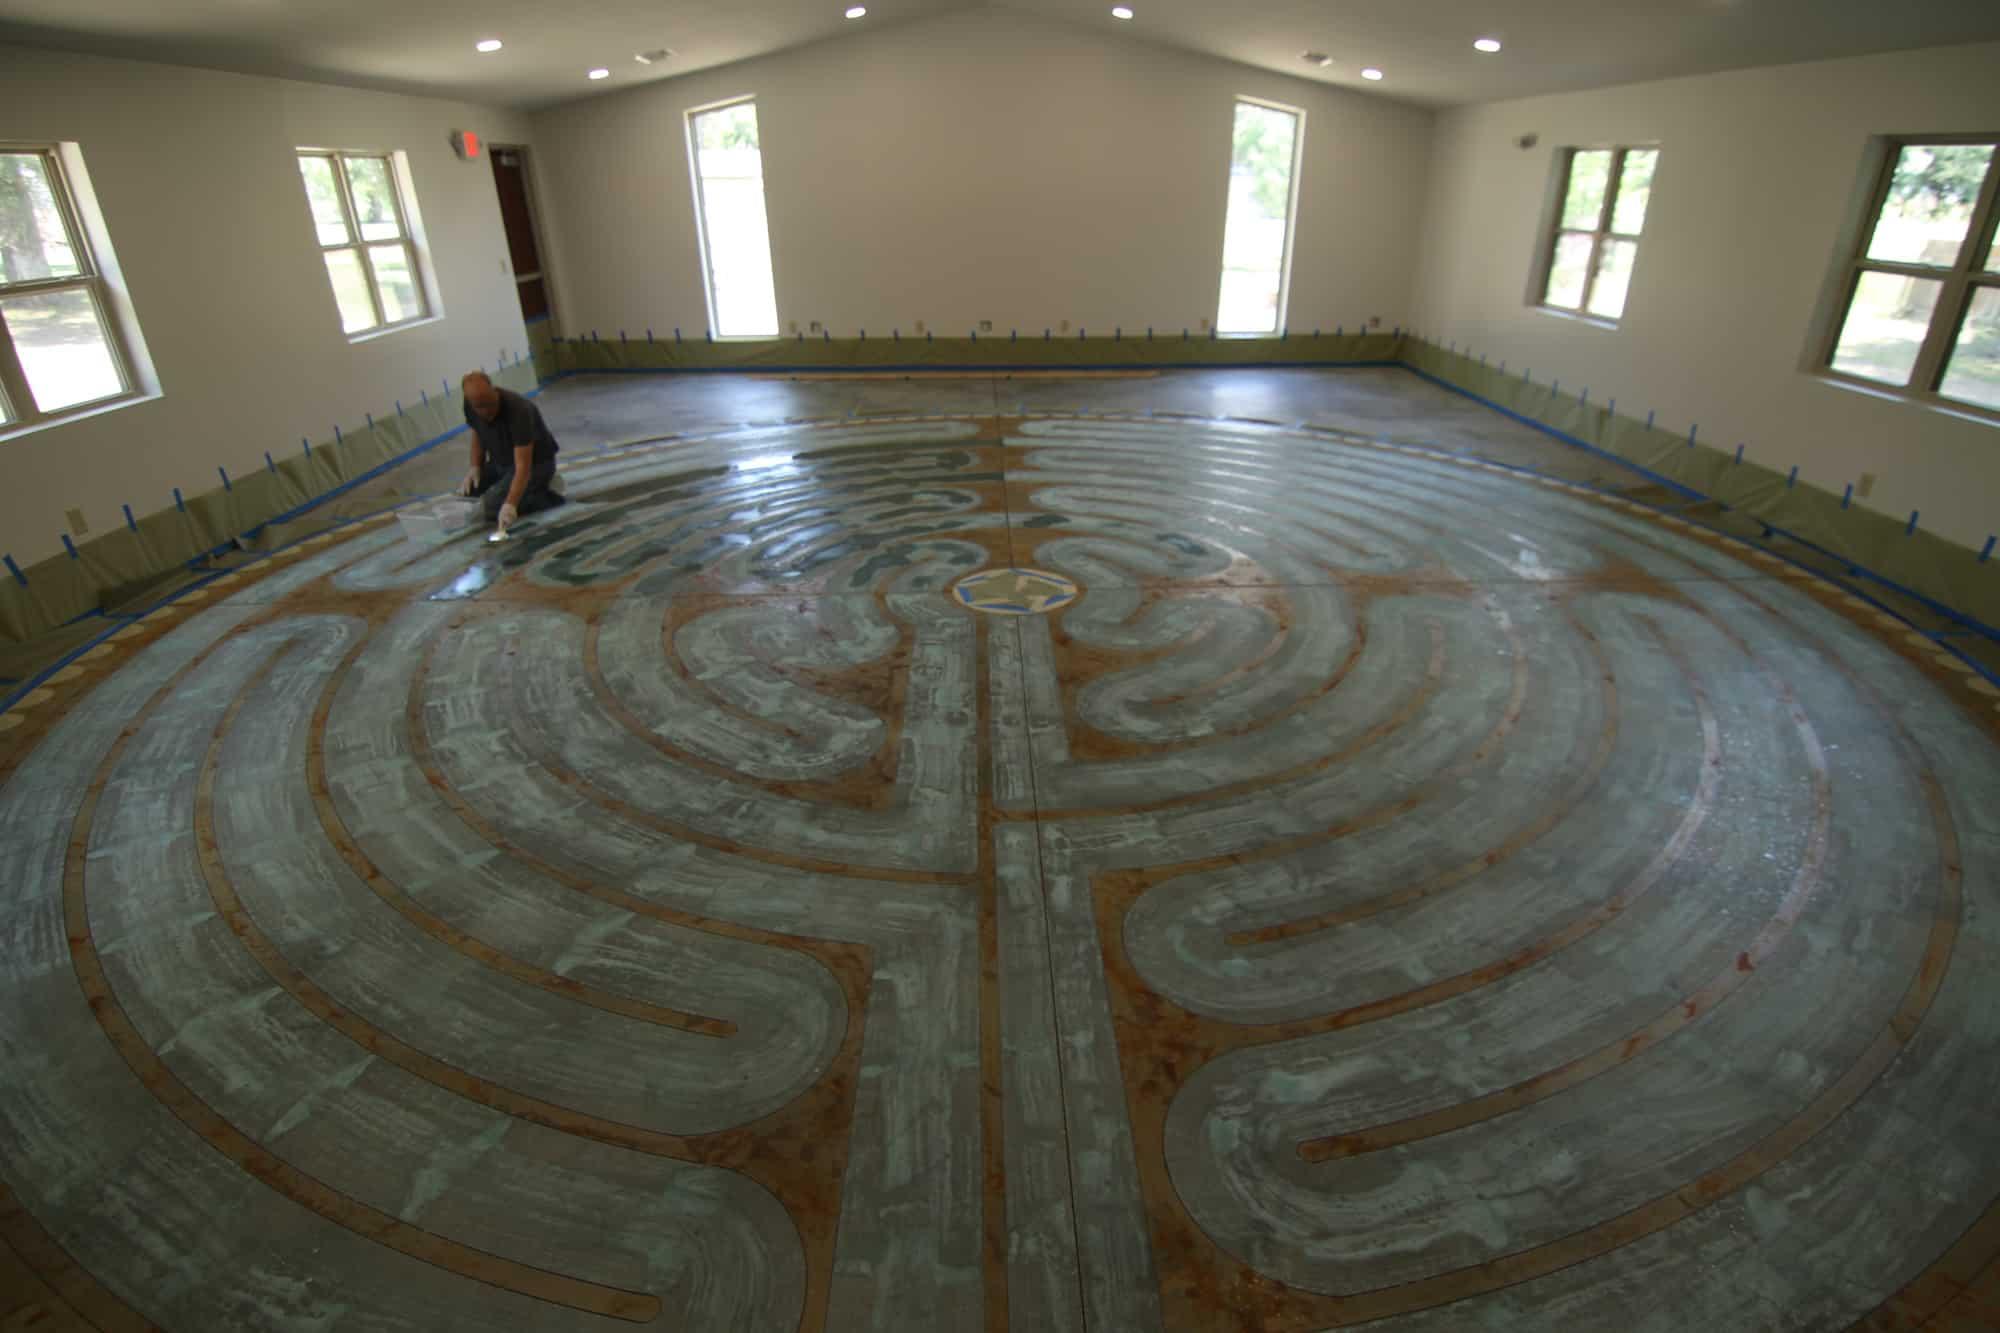 labyrinth at Peace Mennonite Church